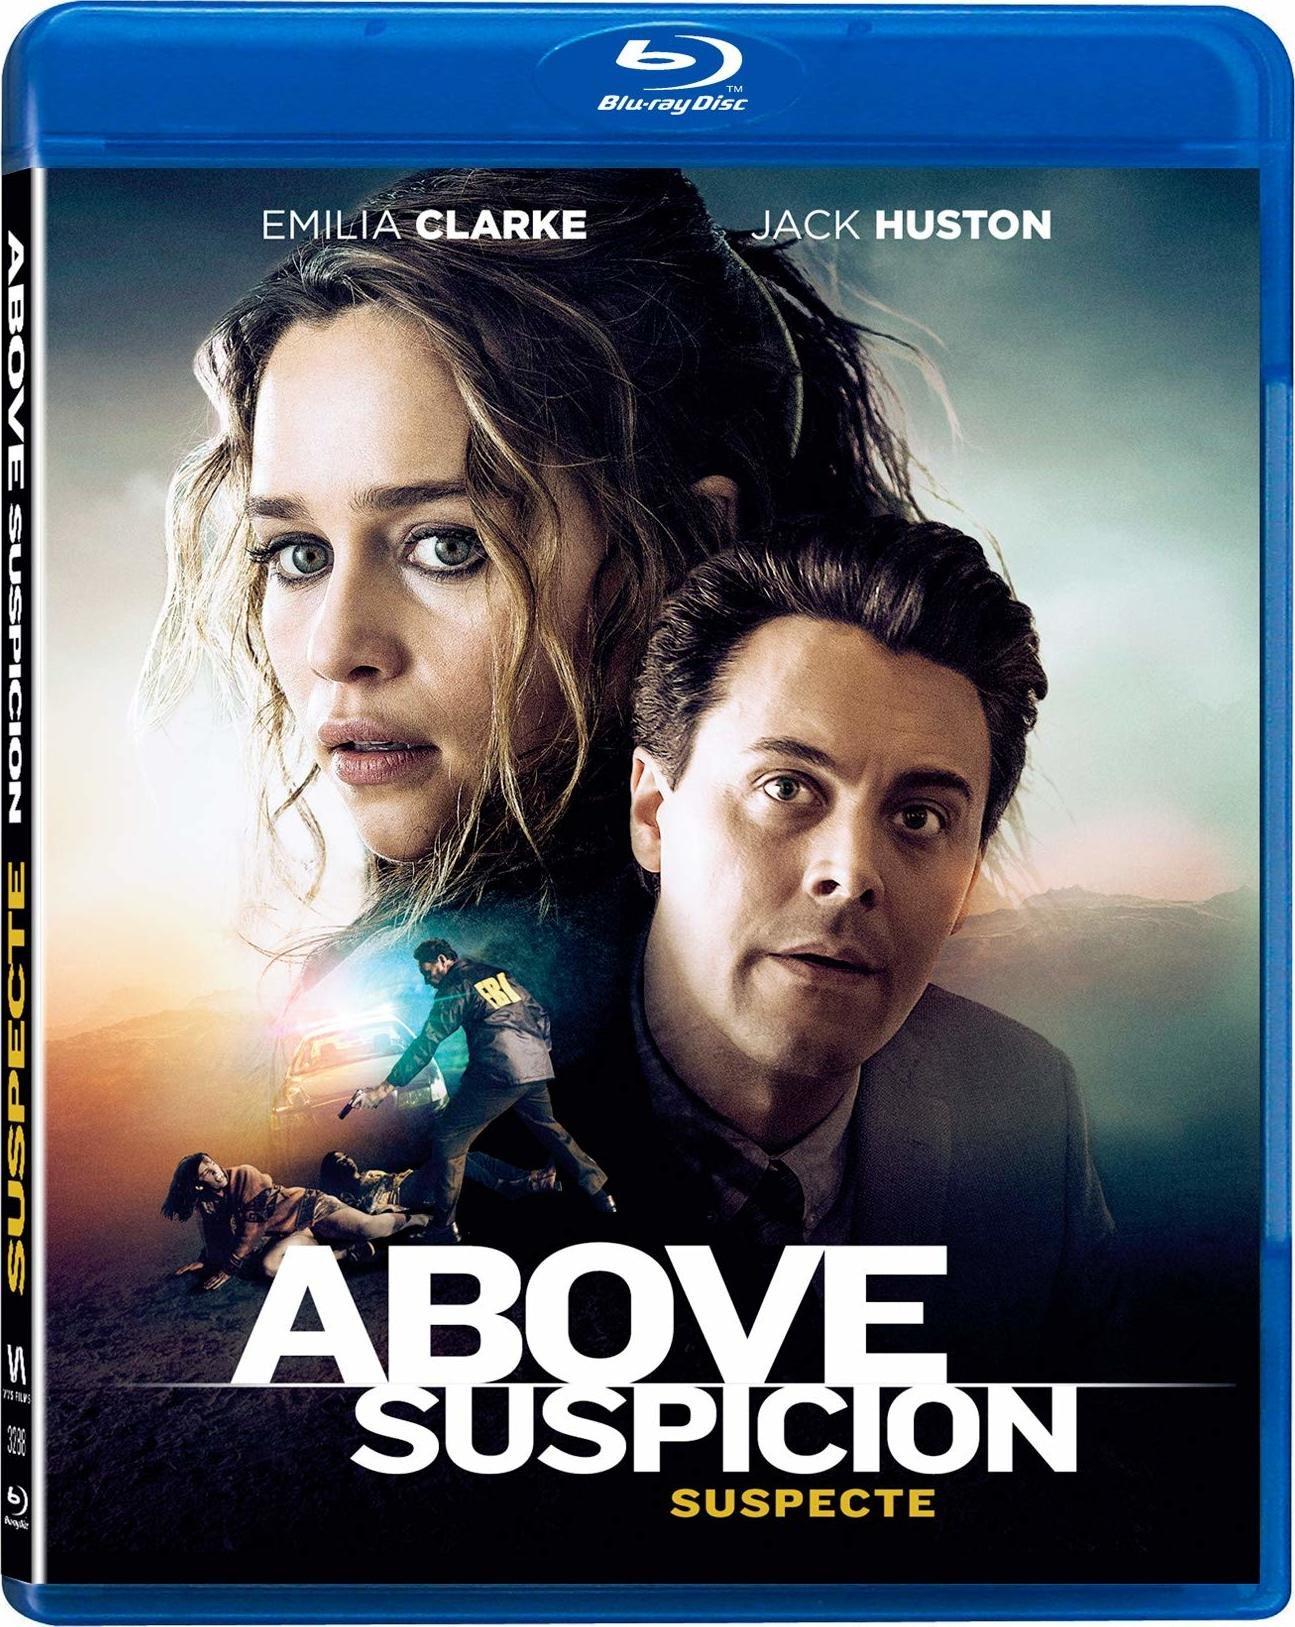 Above Suspicion poster image